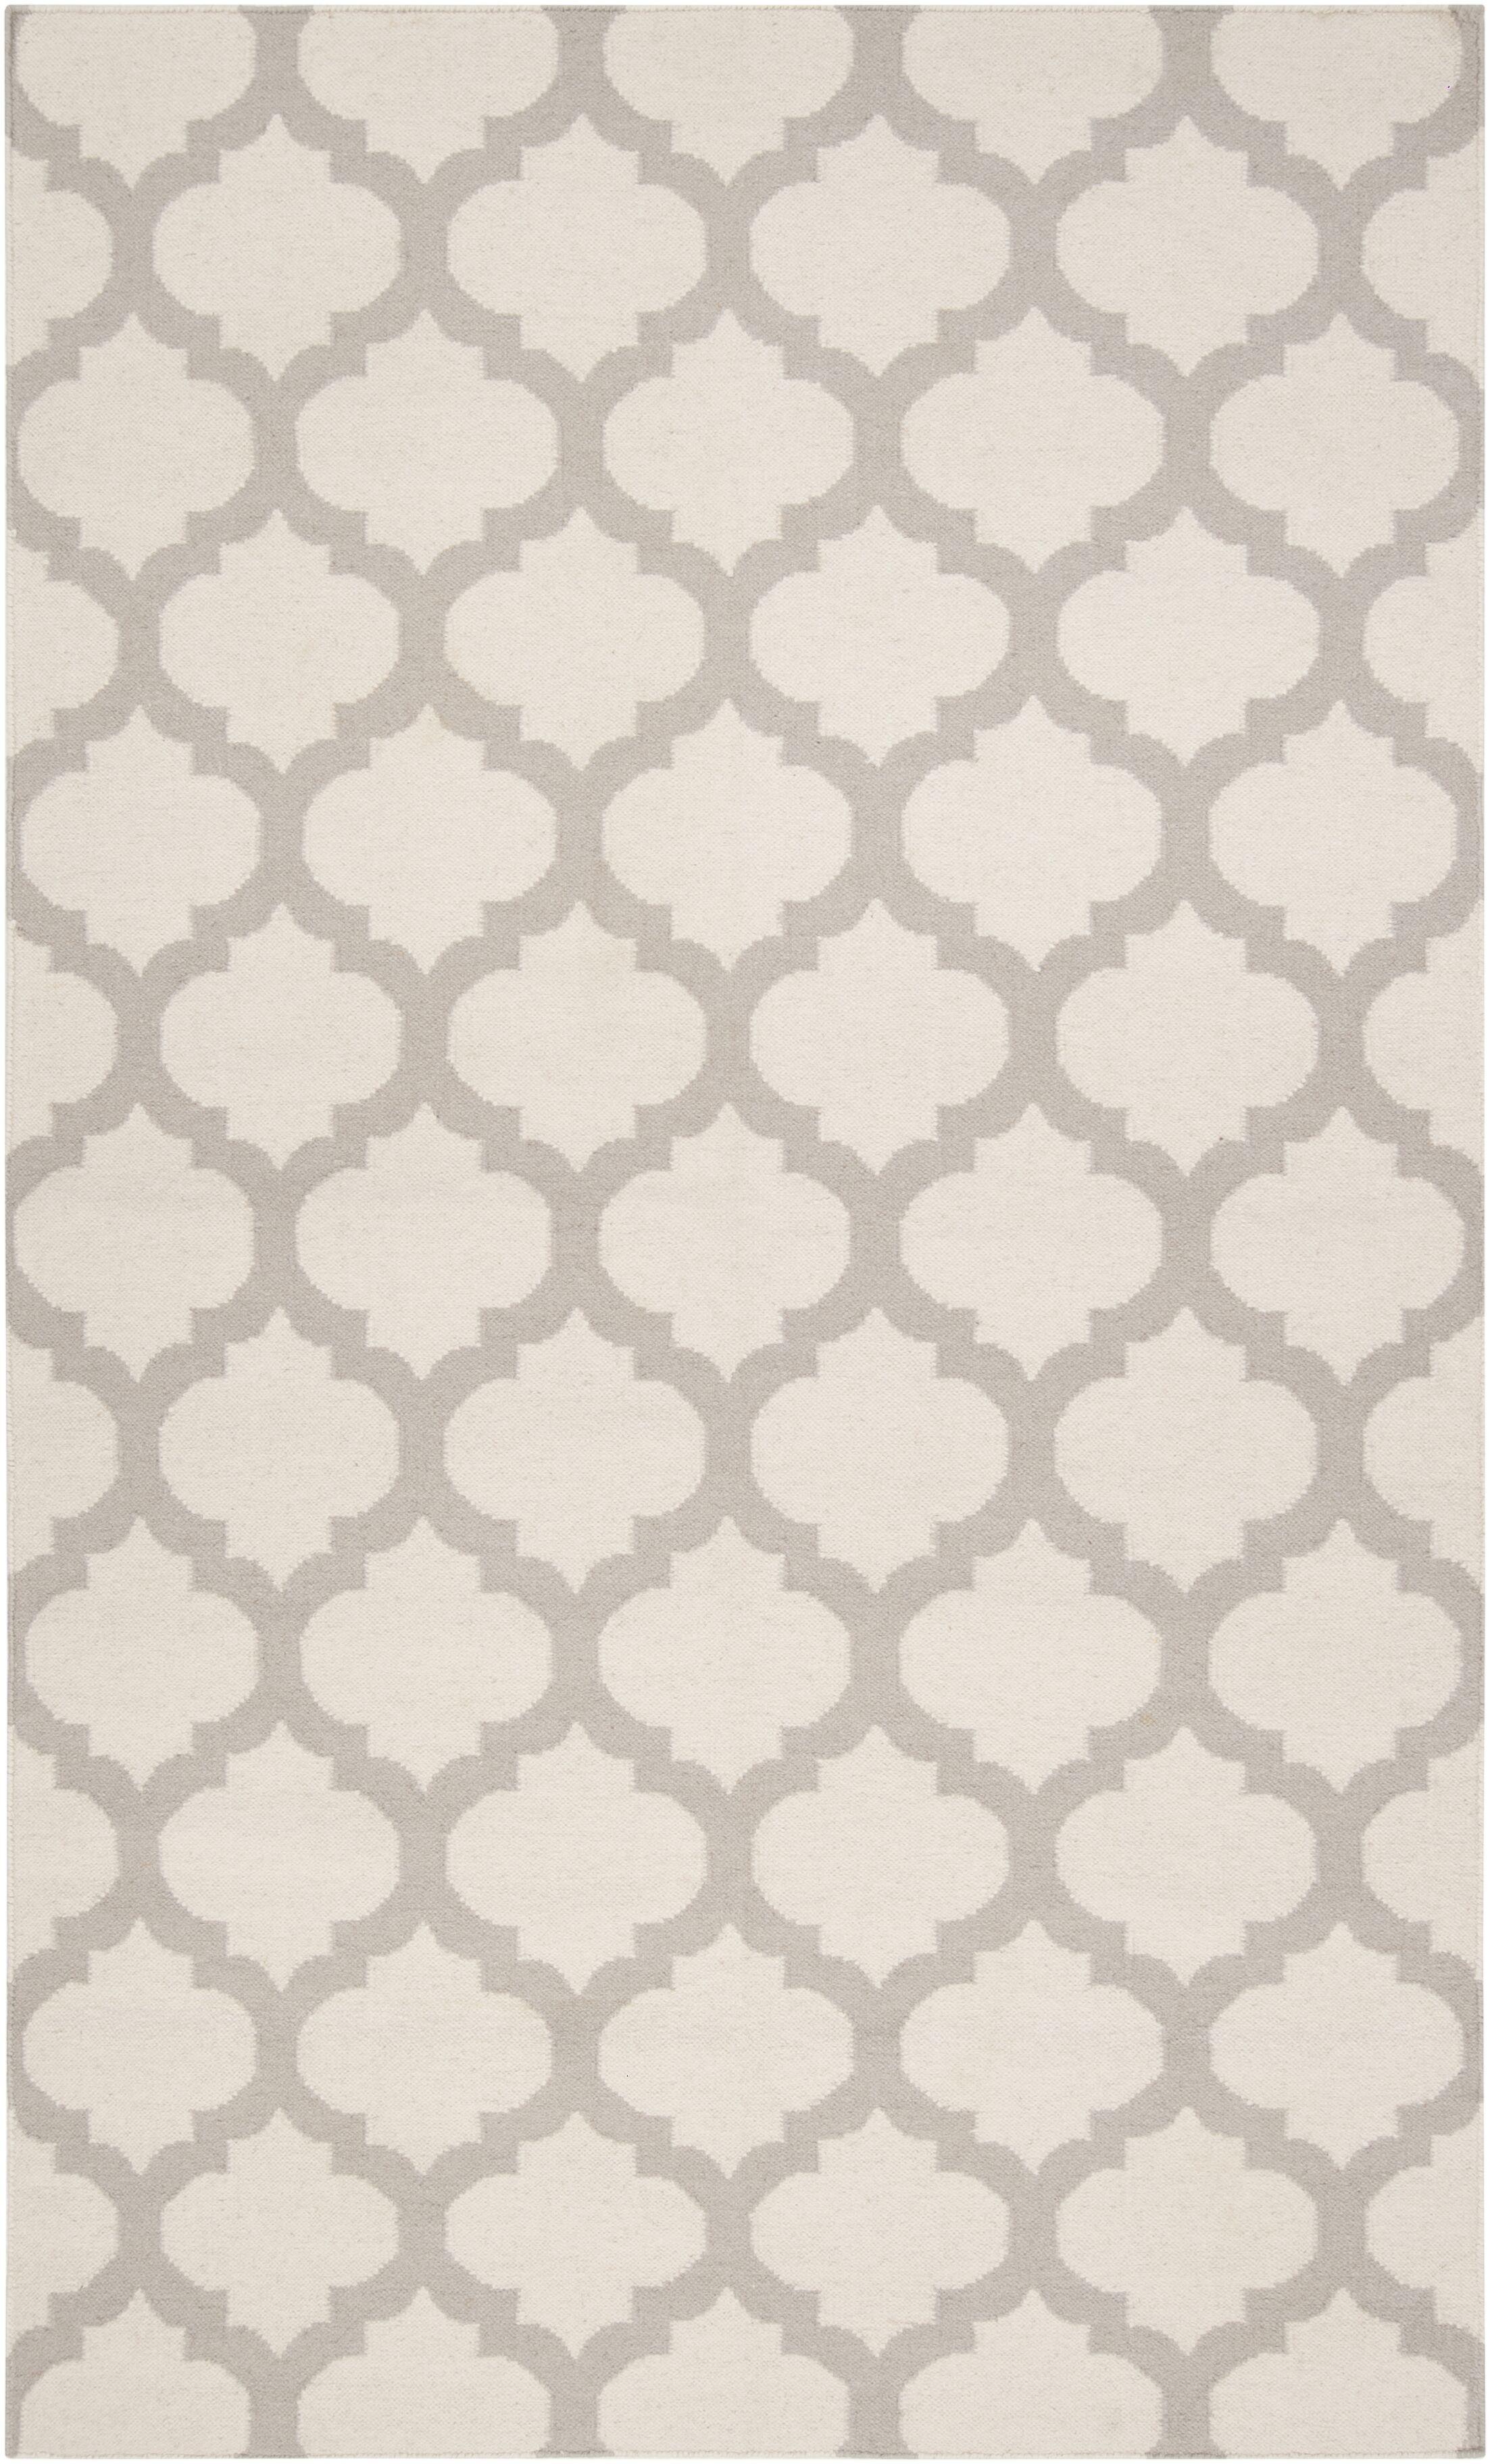 Hackbarth Oatmeal/White Area Rug Rug Size: Rectangle 8' x 11'